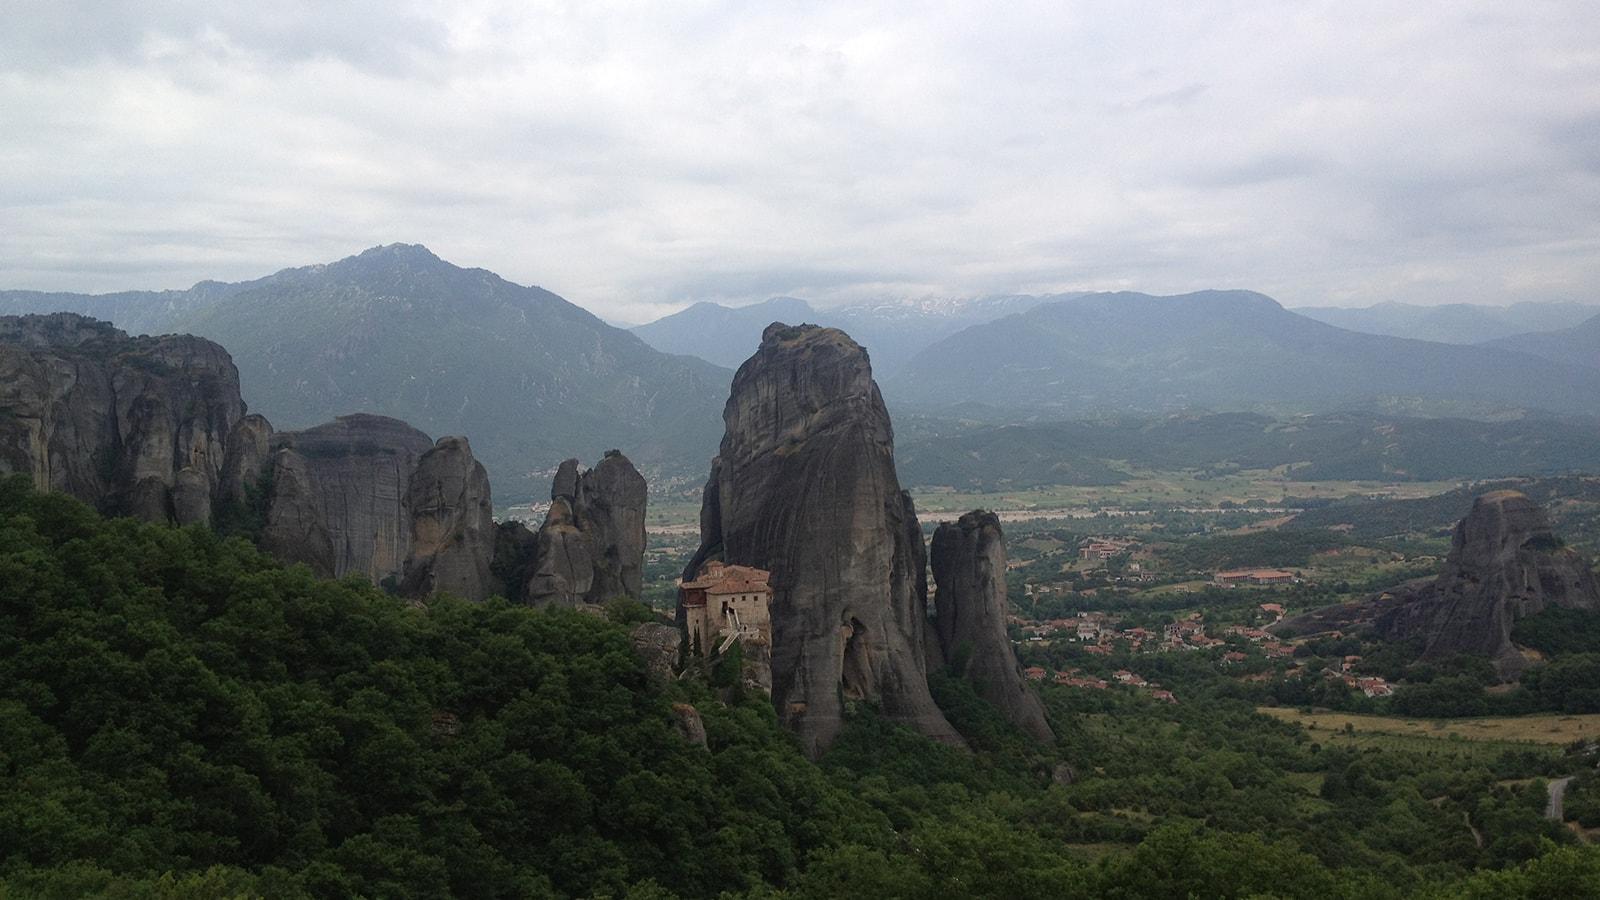 Guy-Stagg-The-Crossway-Meteora-medieval-monasteries-Greece